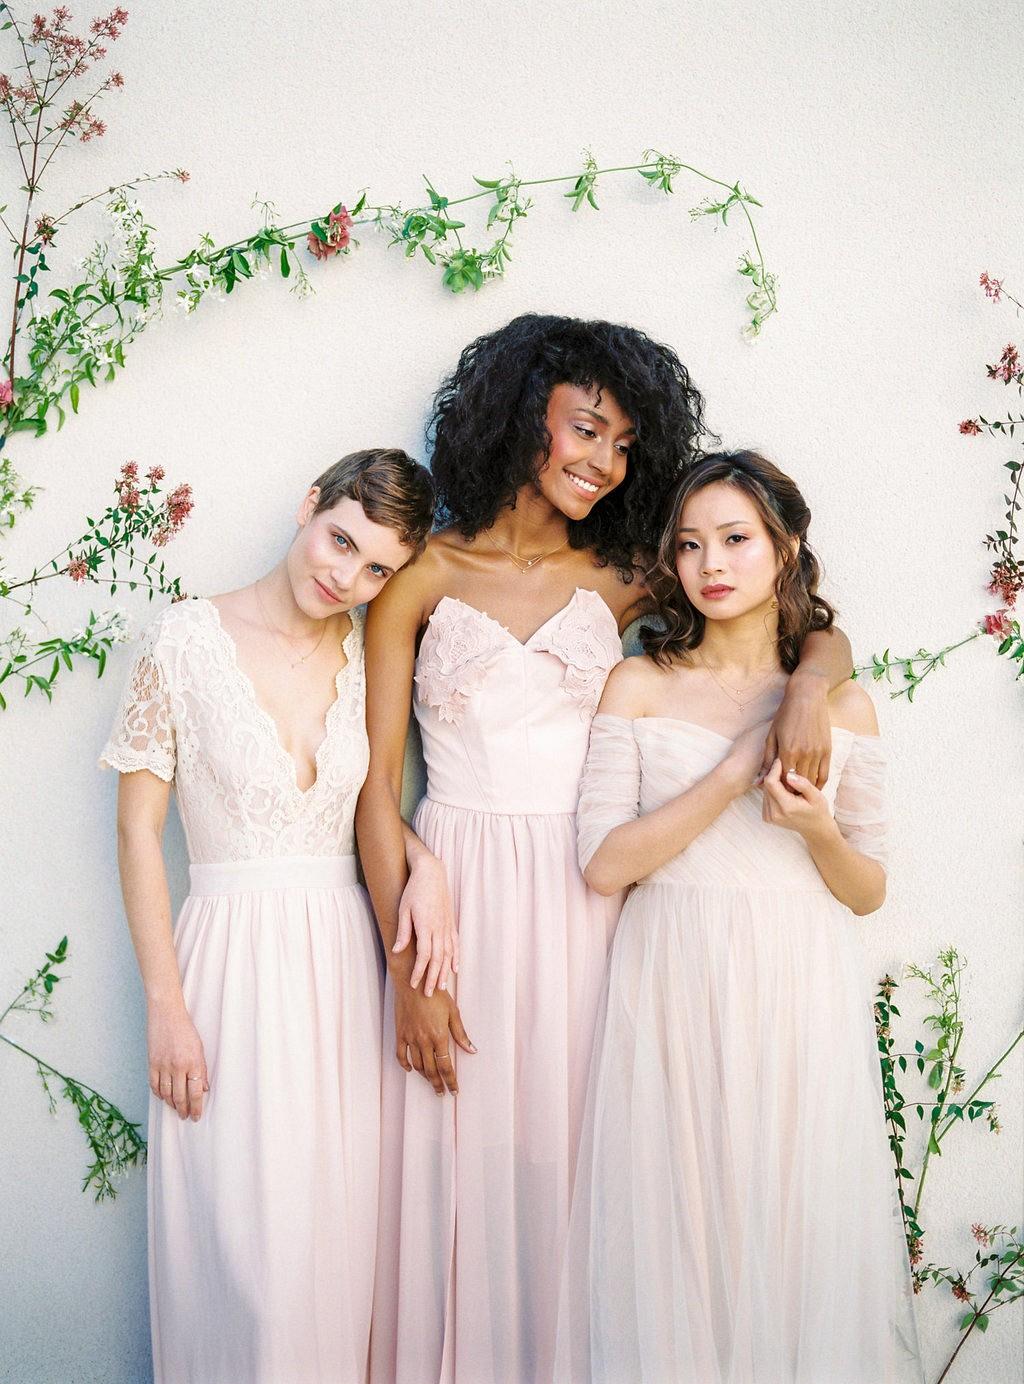 The Power of Sisterhood and Femininity